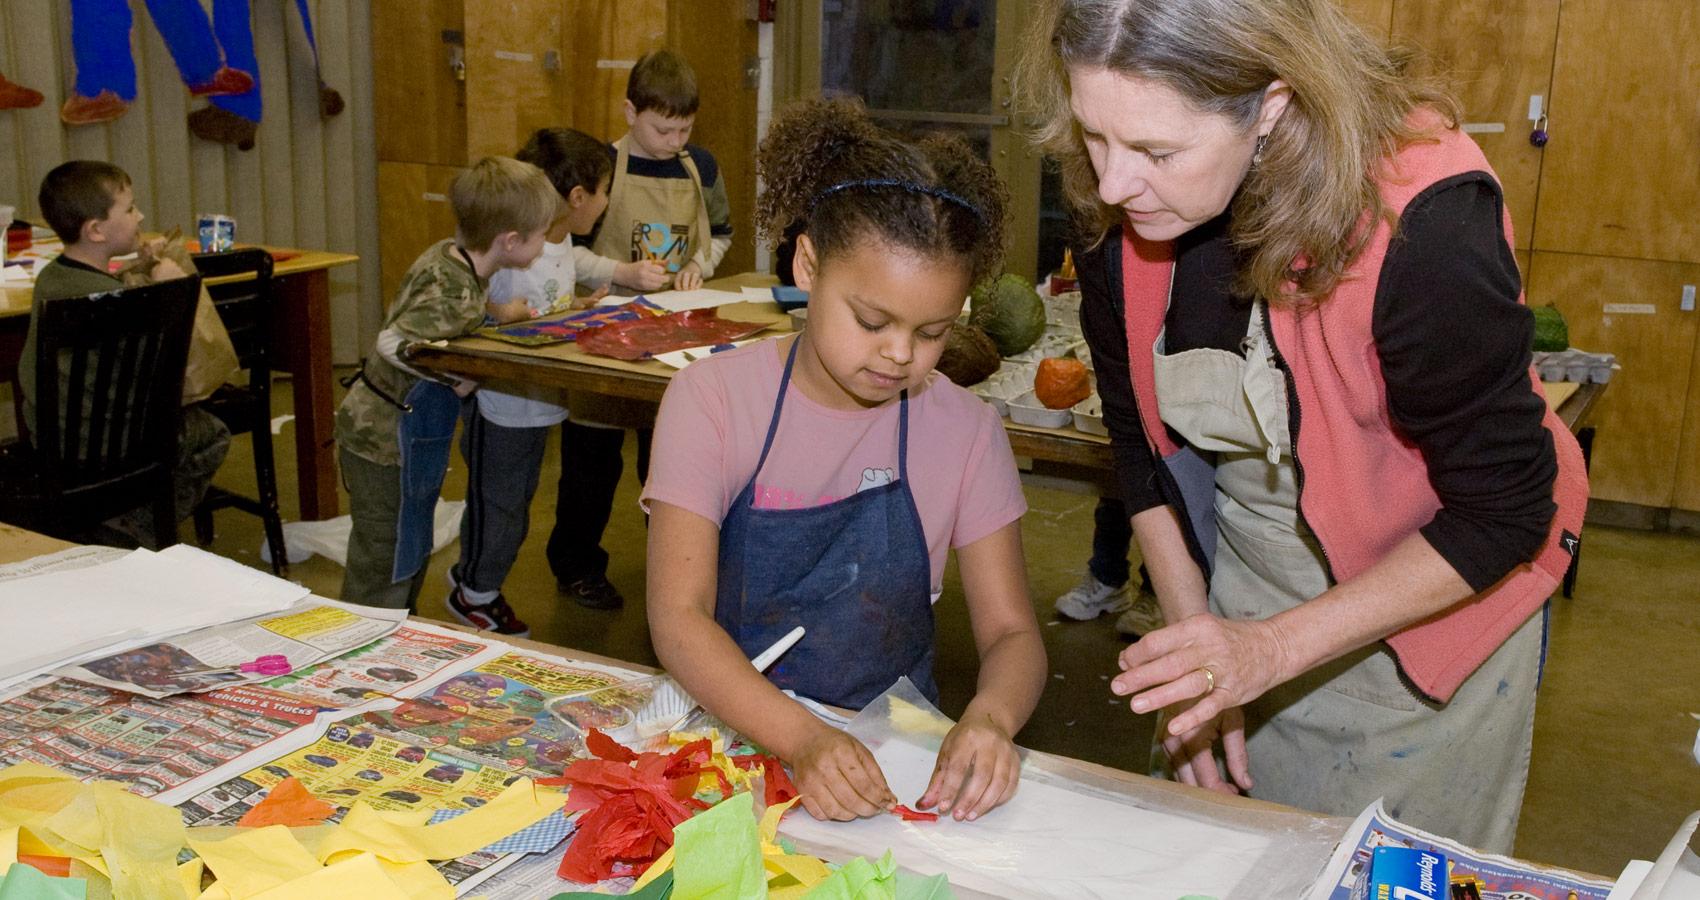 Arrowmont Craft School